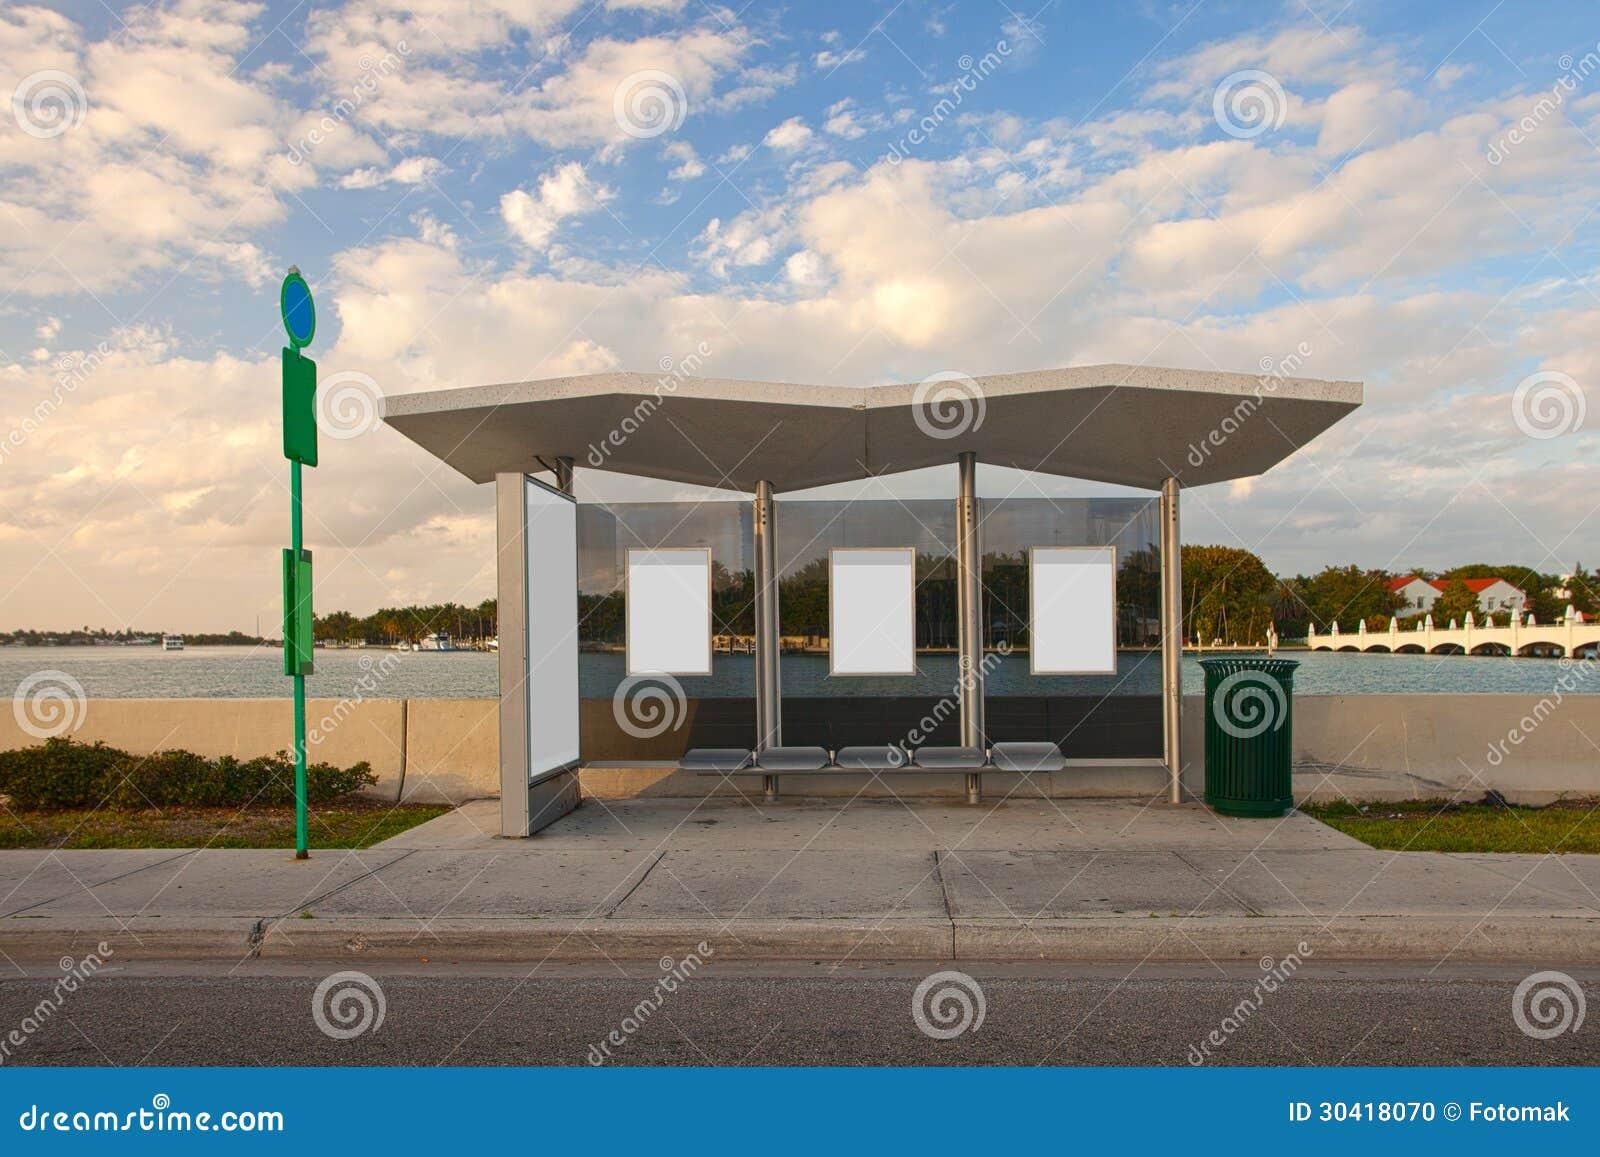 Miami Beach Bus Station